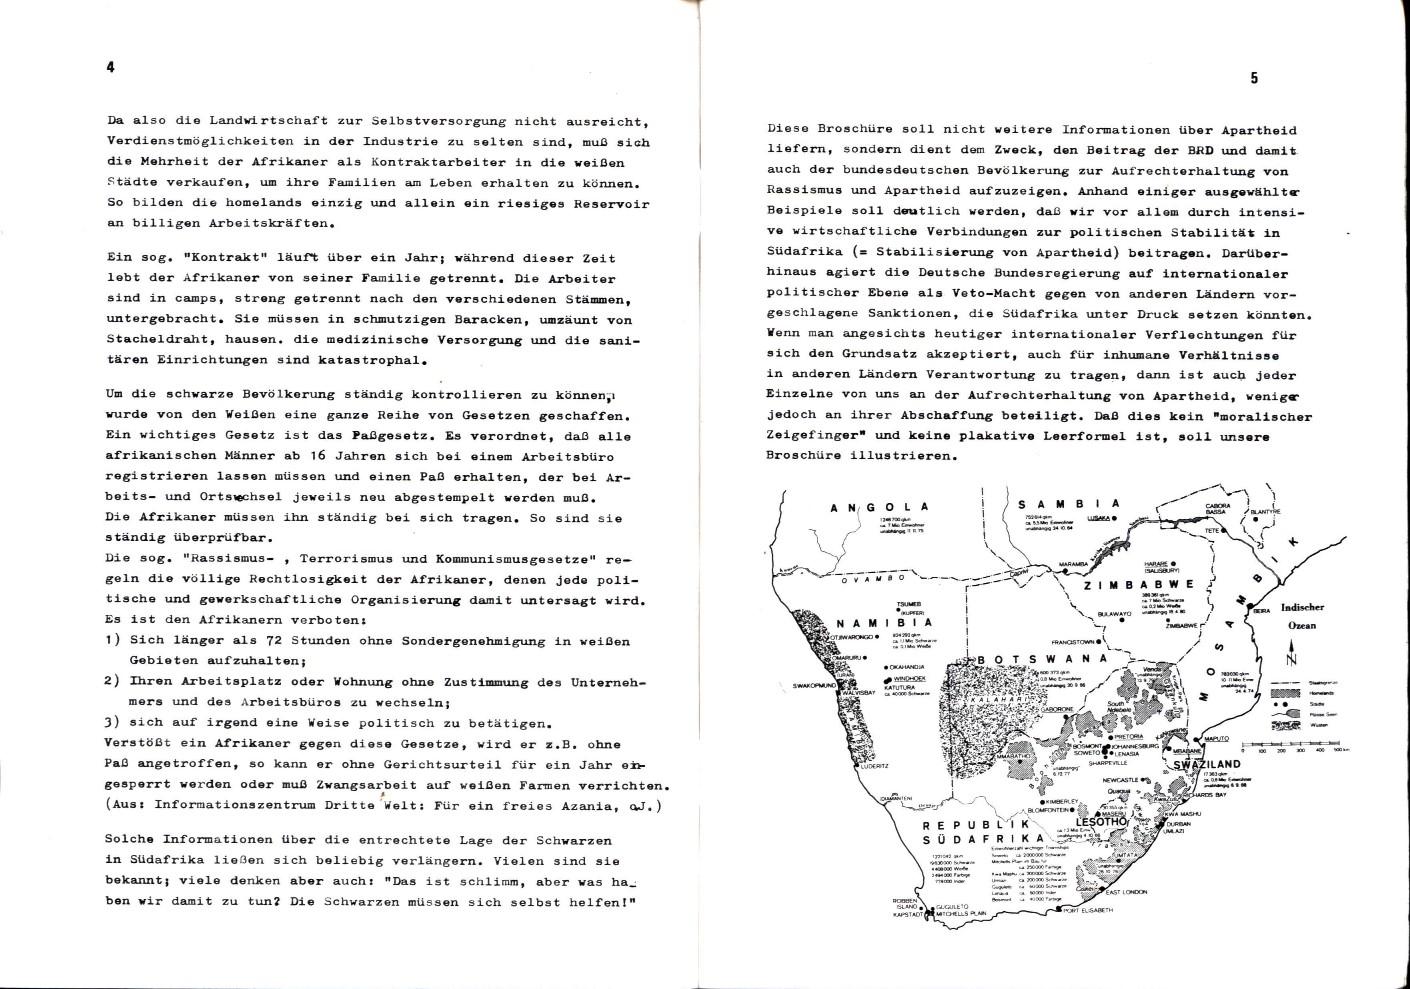 Muenster_AKAFRIK_1981_Suedafrika_BRD_04